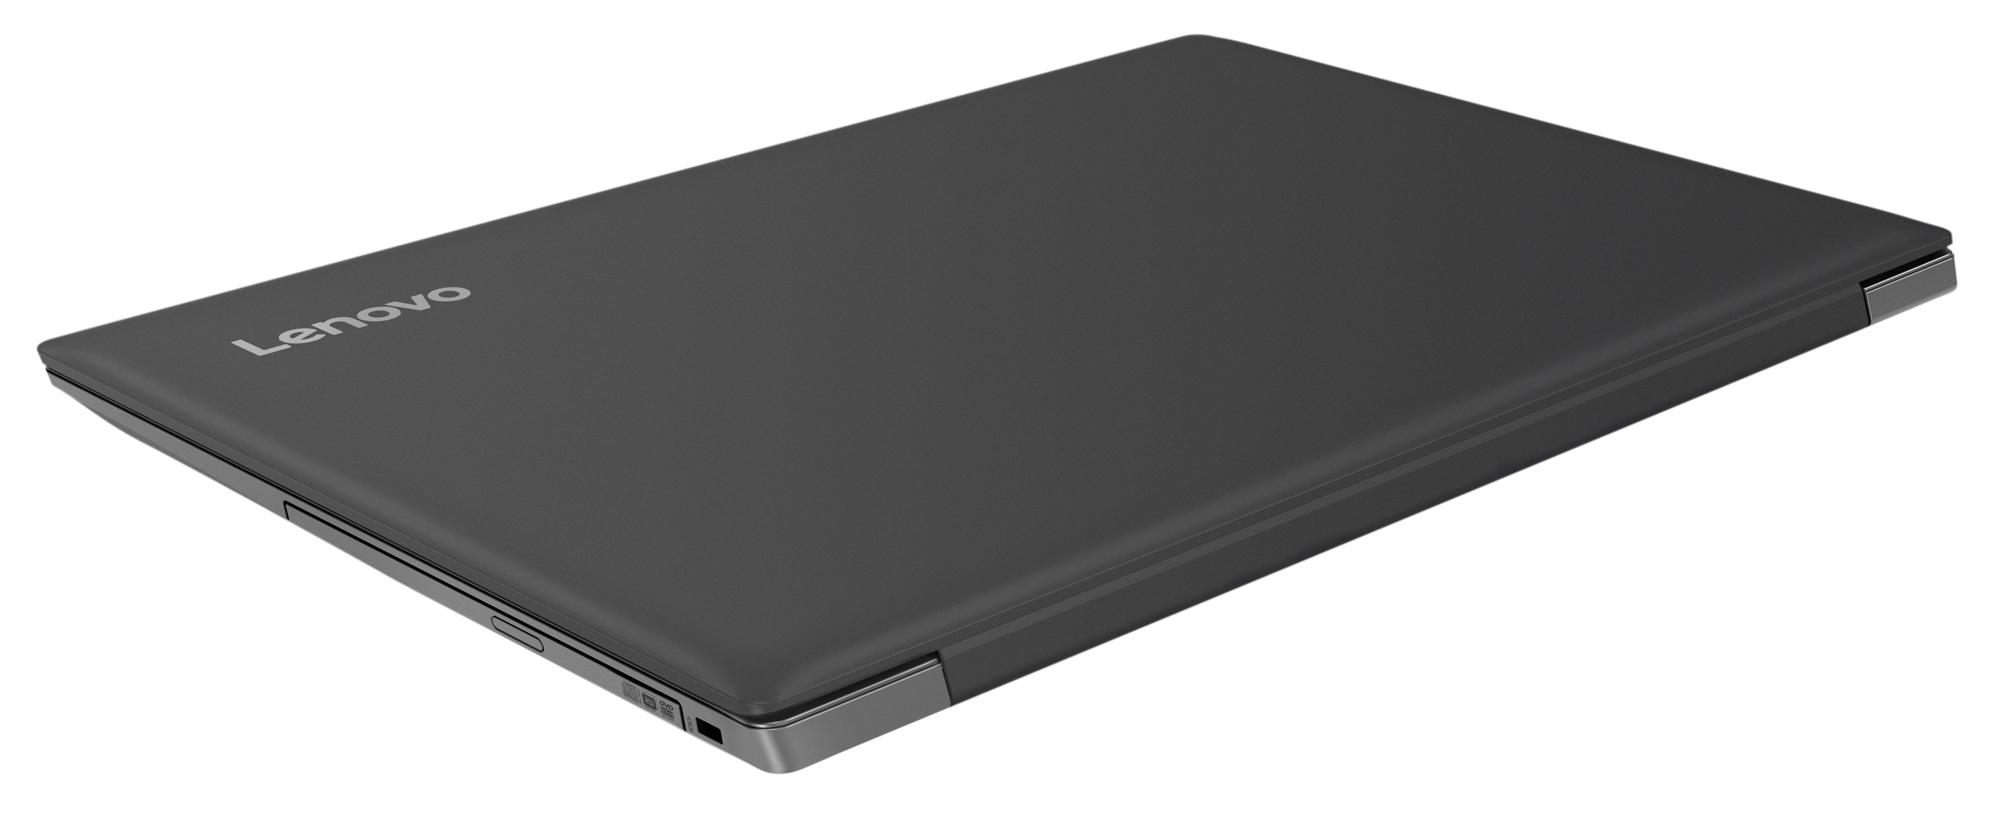 Фото  Ноутбук Lenovo ideapad 330-15 Onyx Black (81DC0105RA)